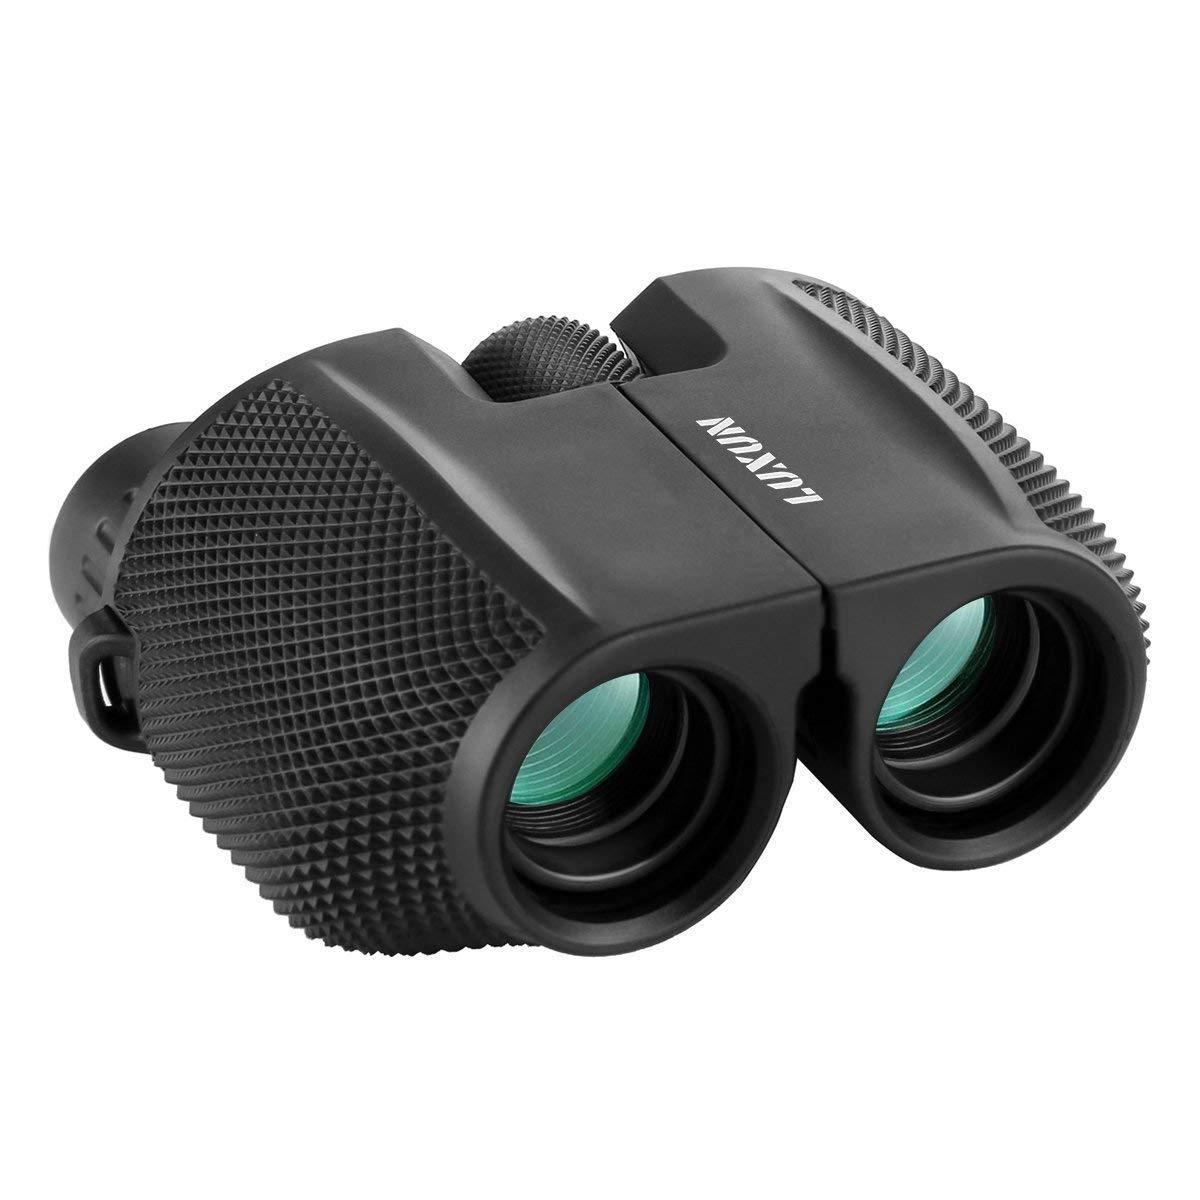 Compact Binoculars, SGODDE 10x25 Waterproof Binocular - Large Eyepiece,Super High Powered Field,Low Light Night Vision Prism Binoculars for Bird Watching Outdoor Shooting Travelling Adults Kids by SGODDE